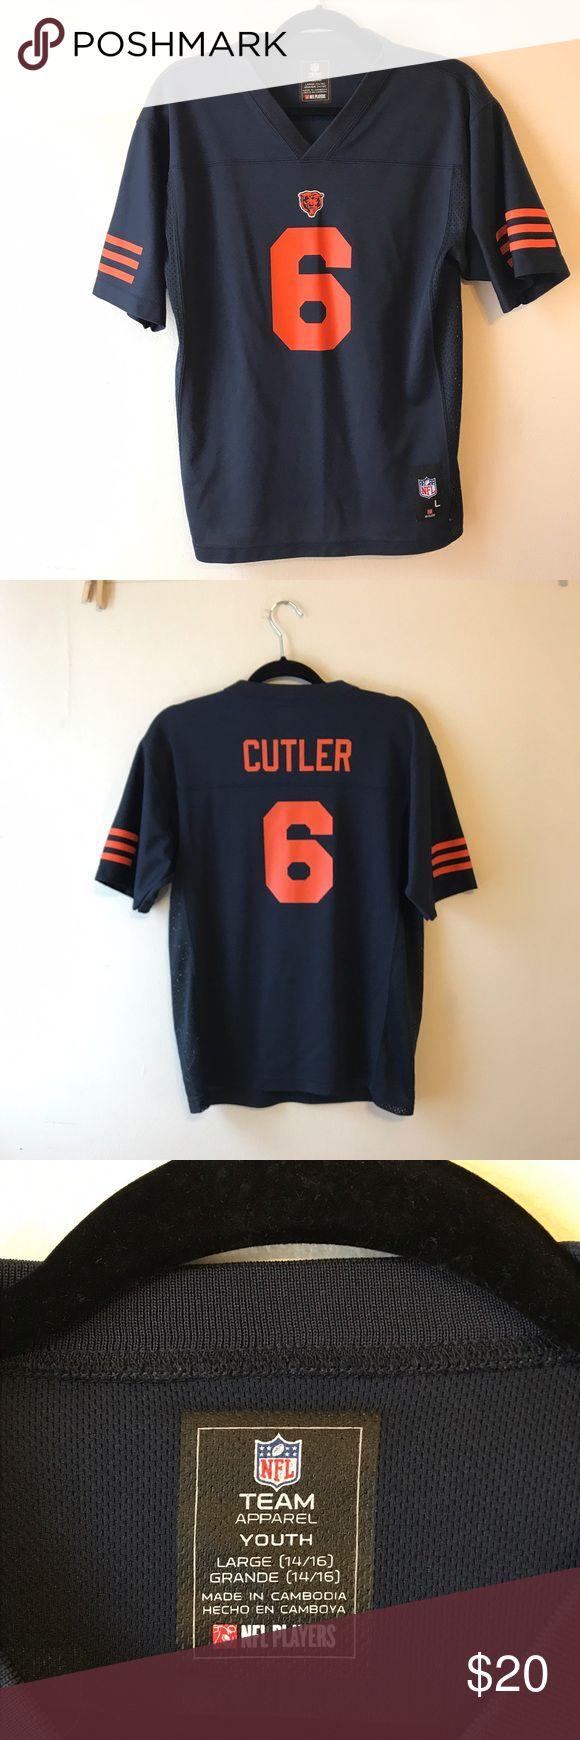 Boys Bears Cutler Jersey ⭐️❗️20% OFF bundles of 3+ items❗️⭐️ nfl Shirts & Tops Tees - Short Sleeve